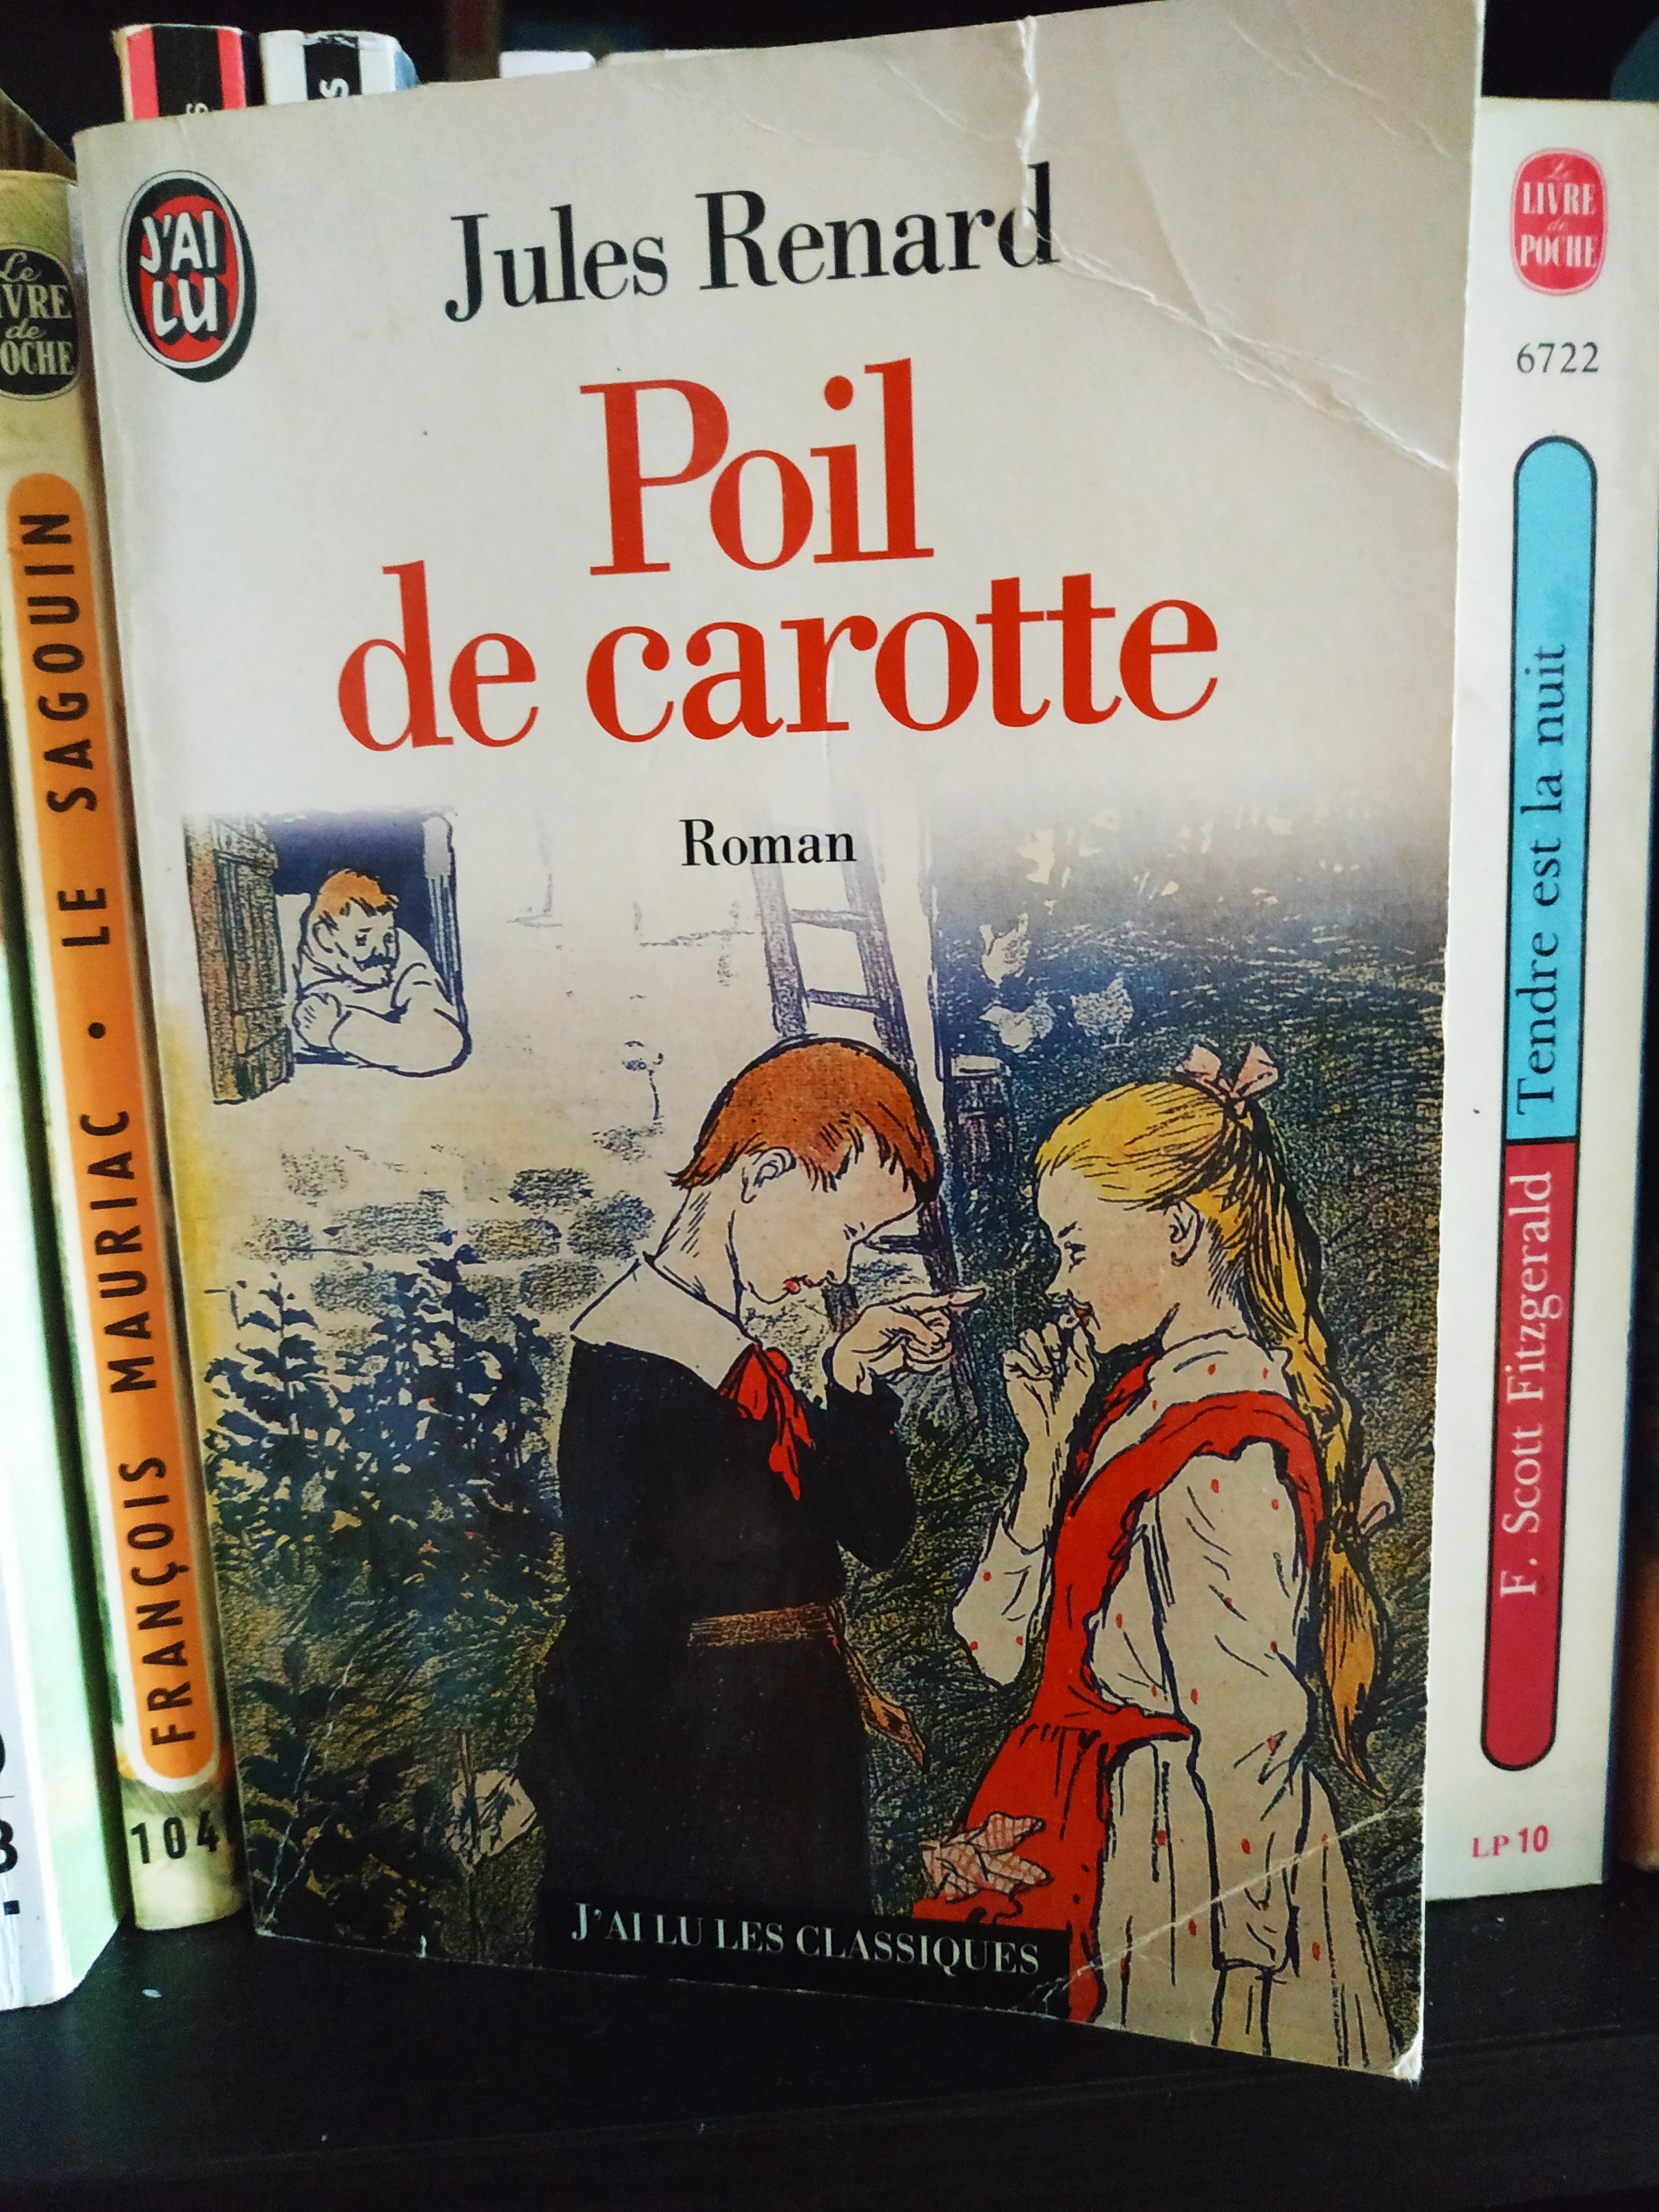 Nom De Famille Poil De Carotte : famille, carotte, Carotte, Jules, Renard